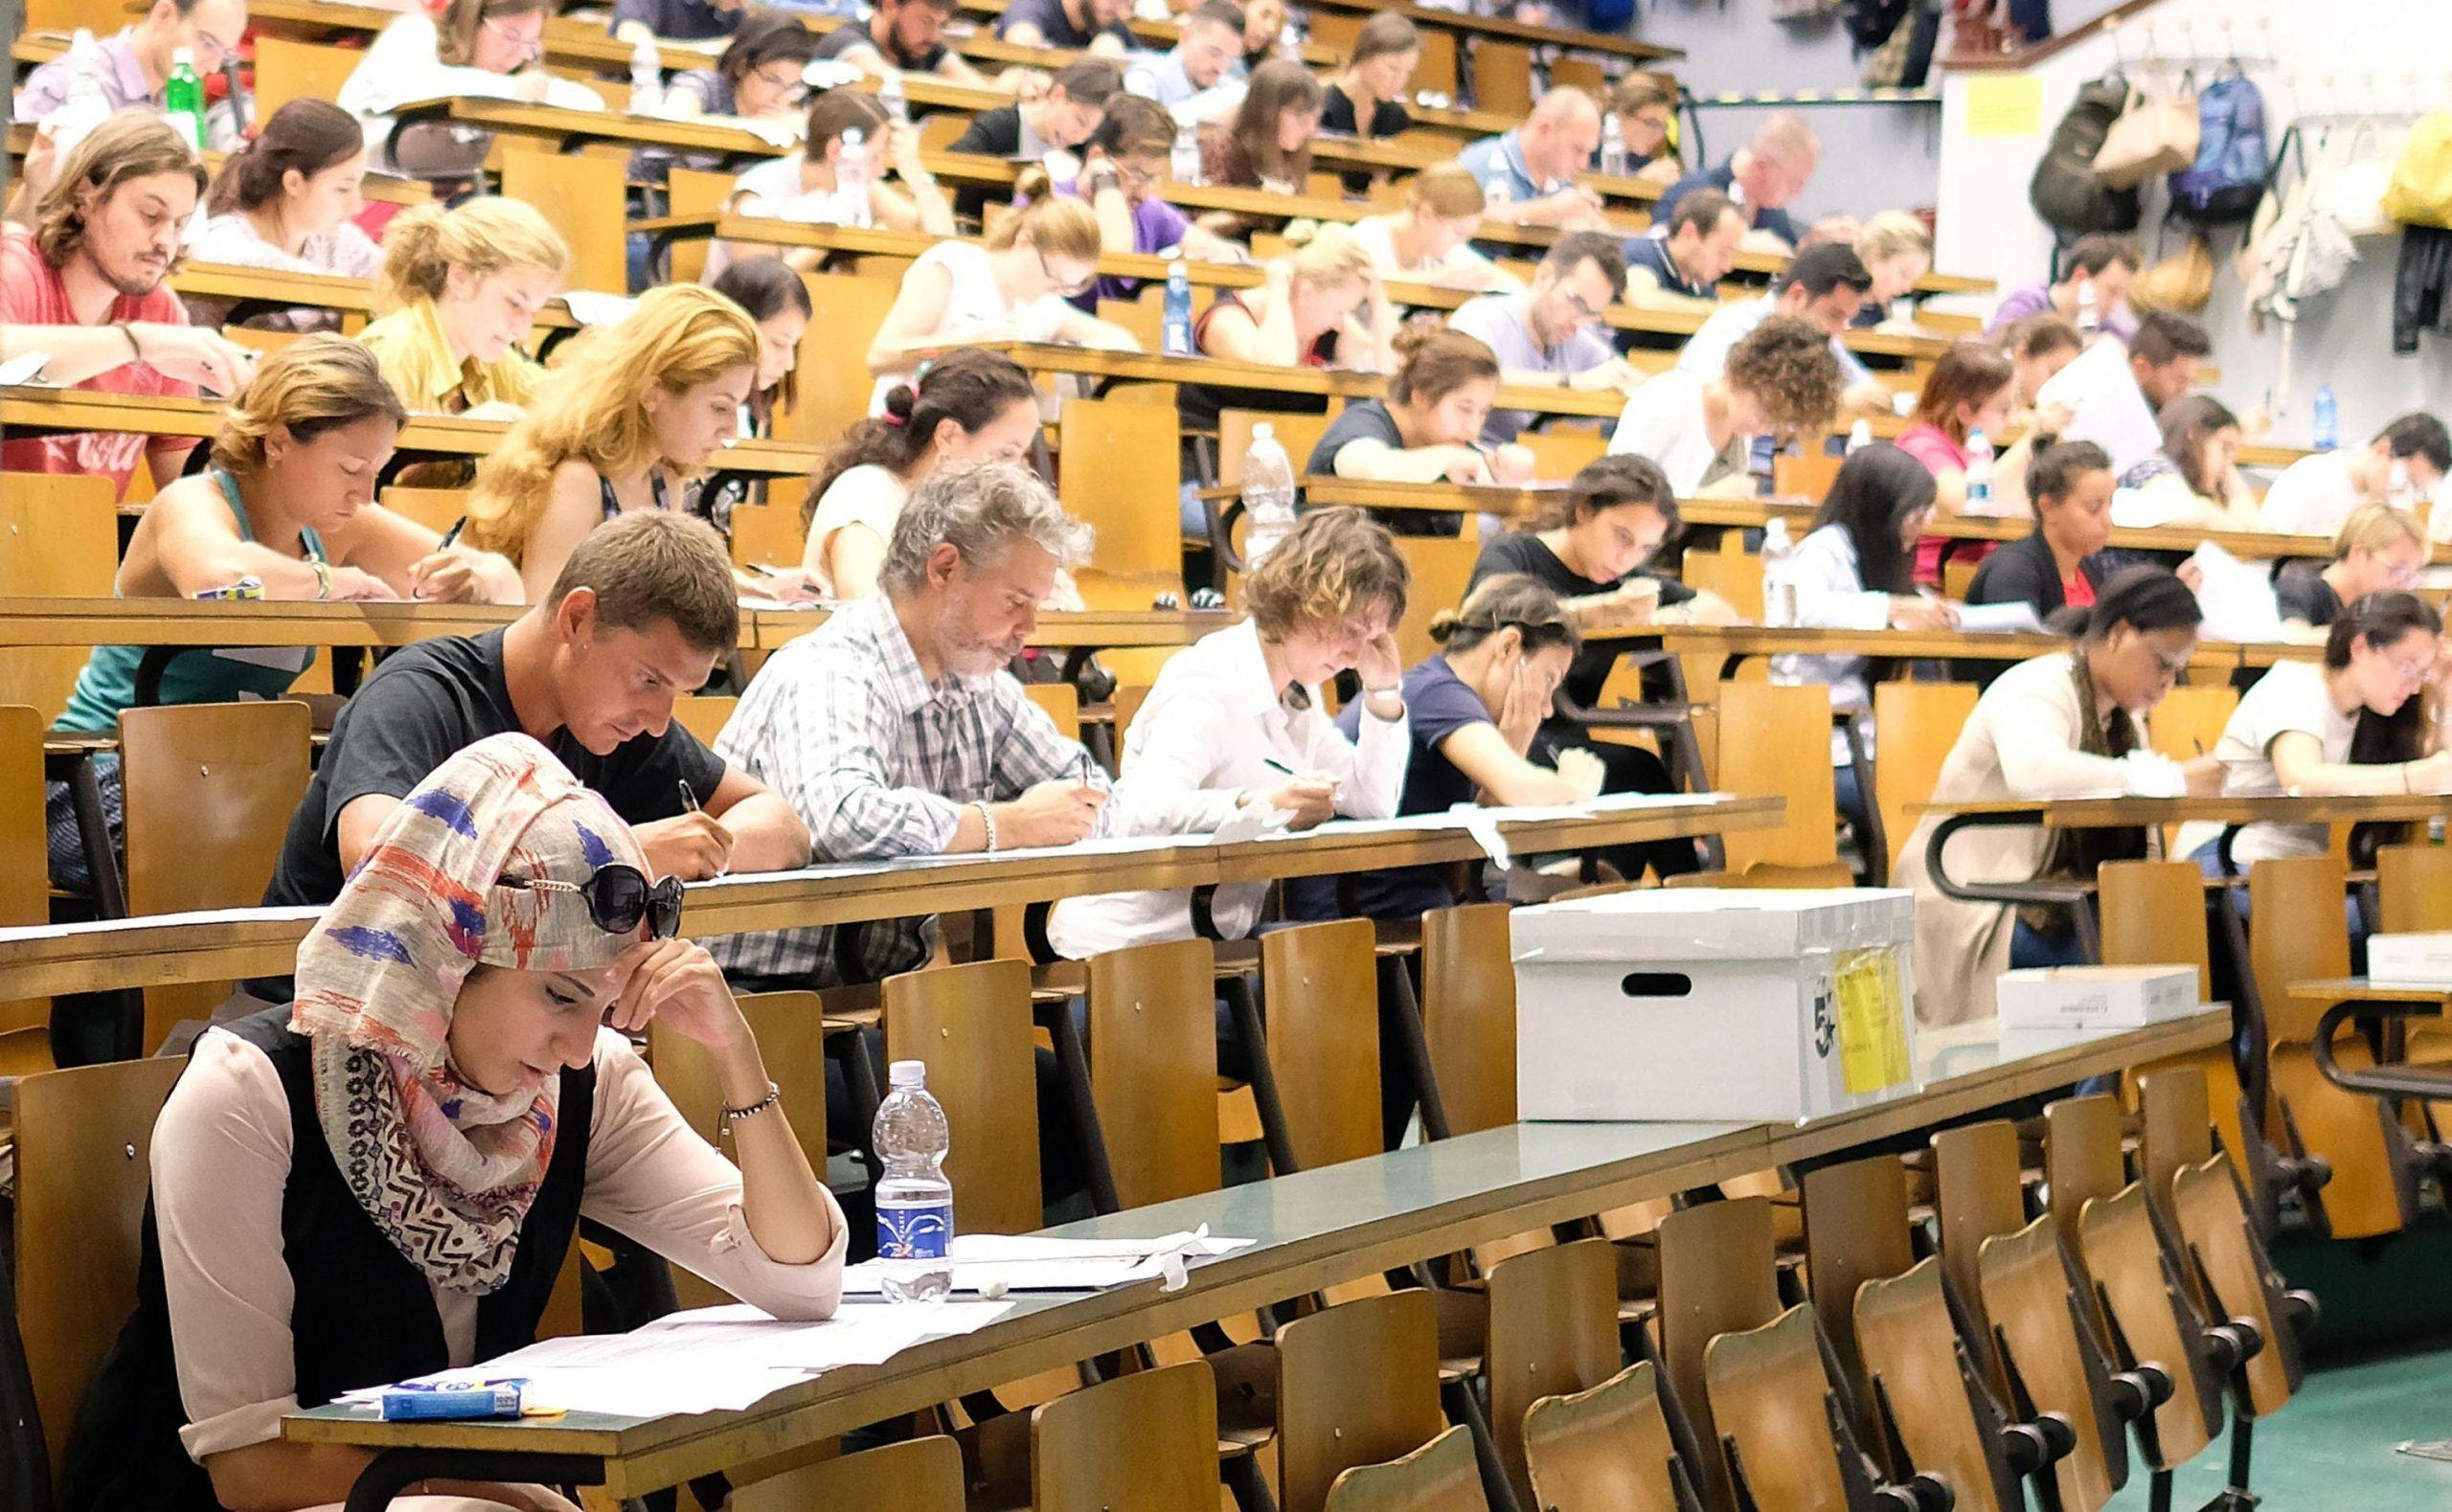 test ingresso università 2018